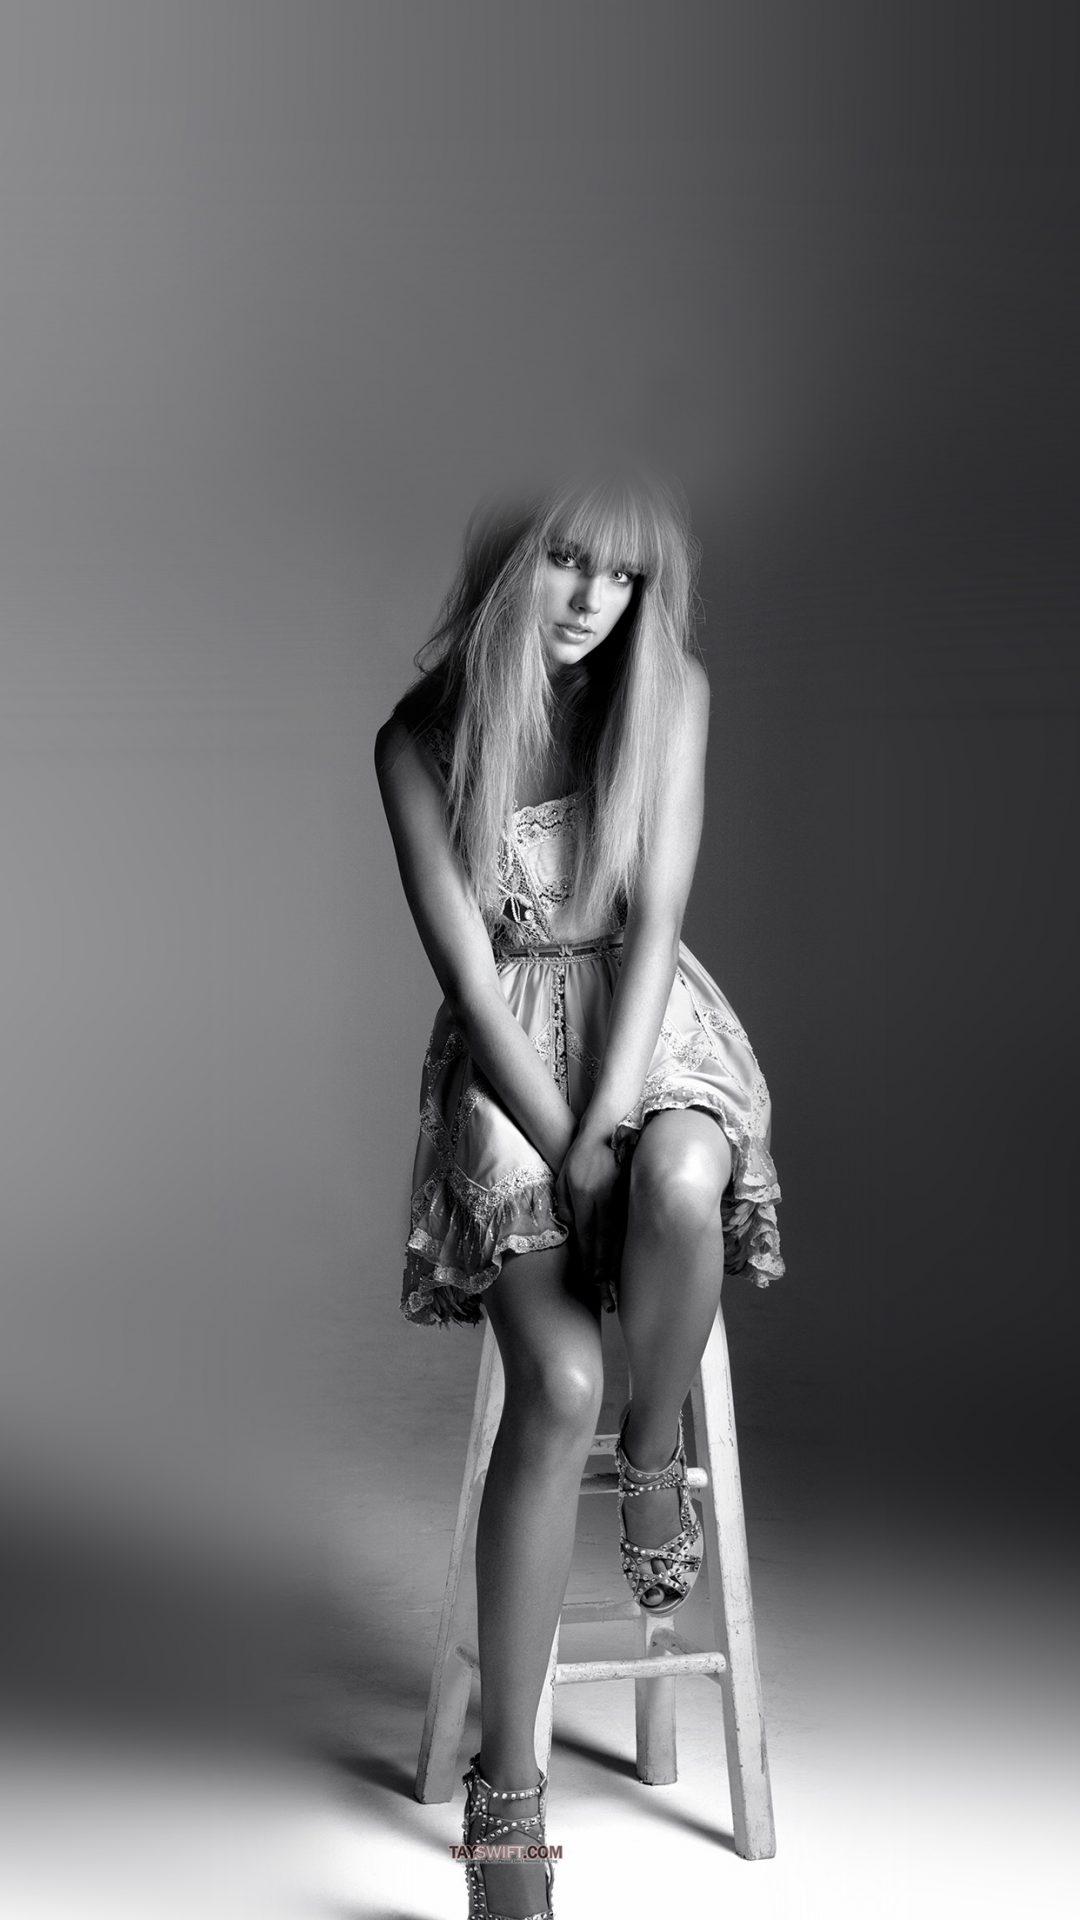 Taylor Swift Singer Bw Celebrity